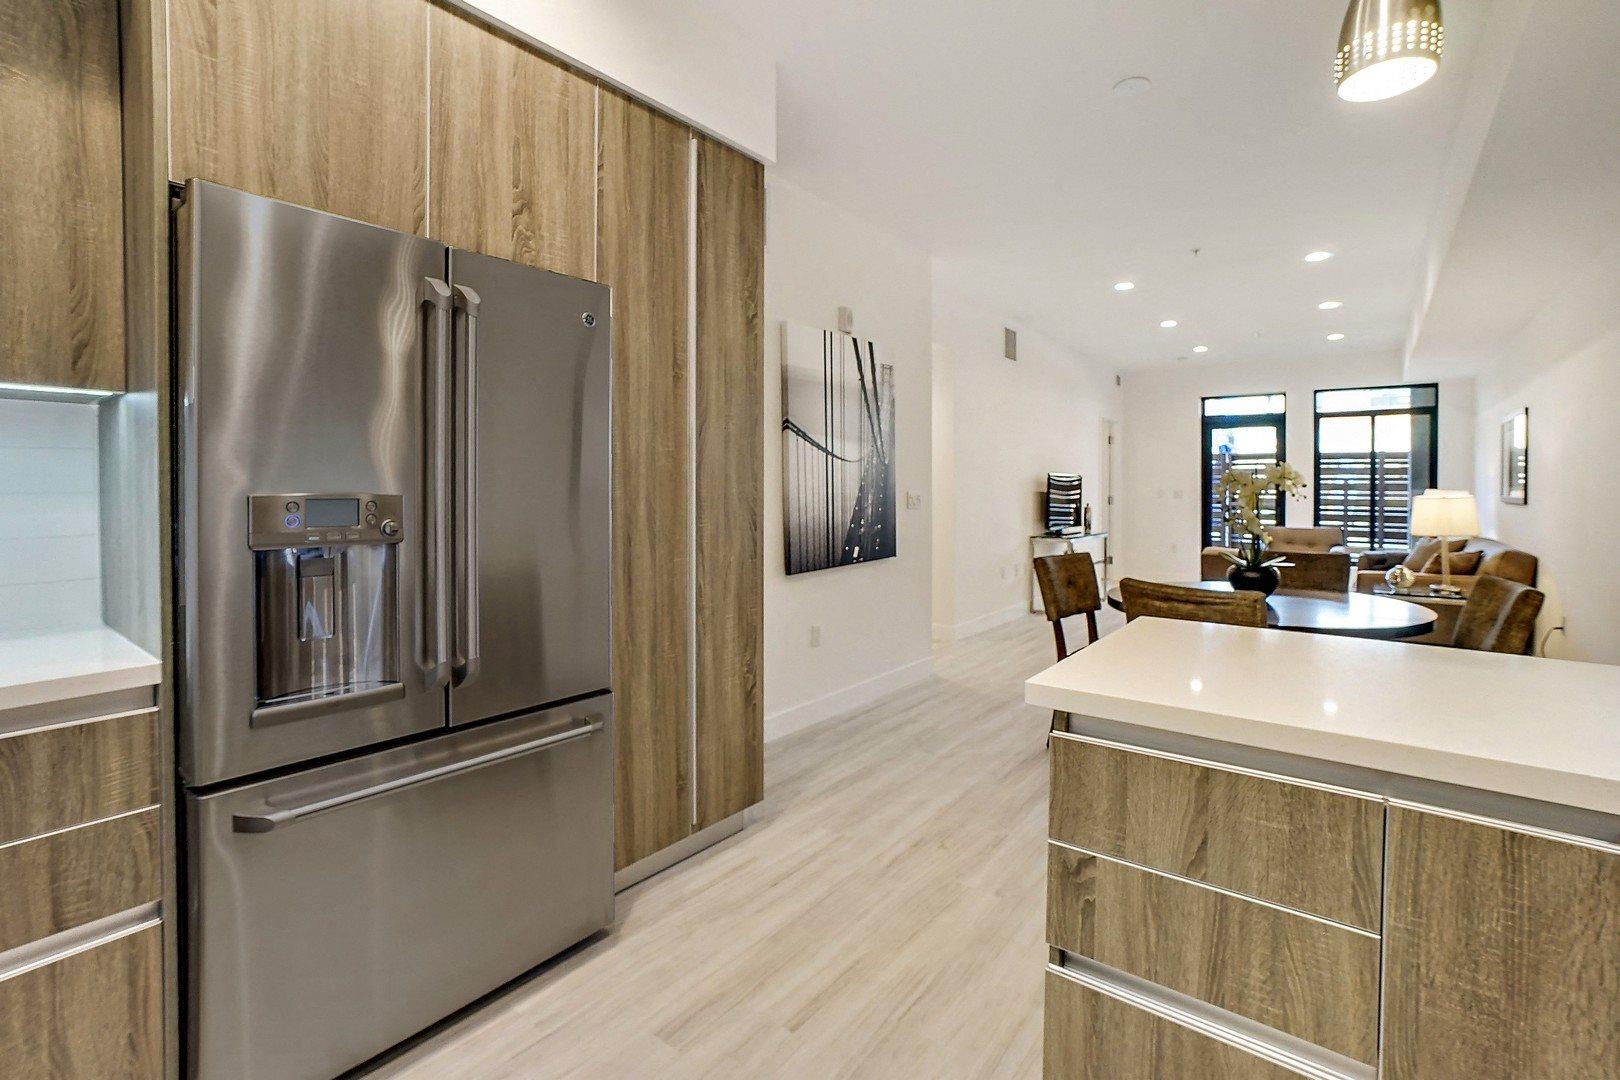 Luxury Lofts in Tarzana CA - The Residences at Village Walk Kitchen